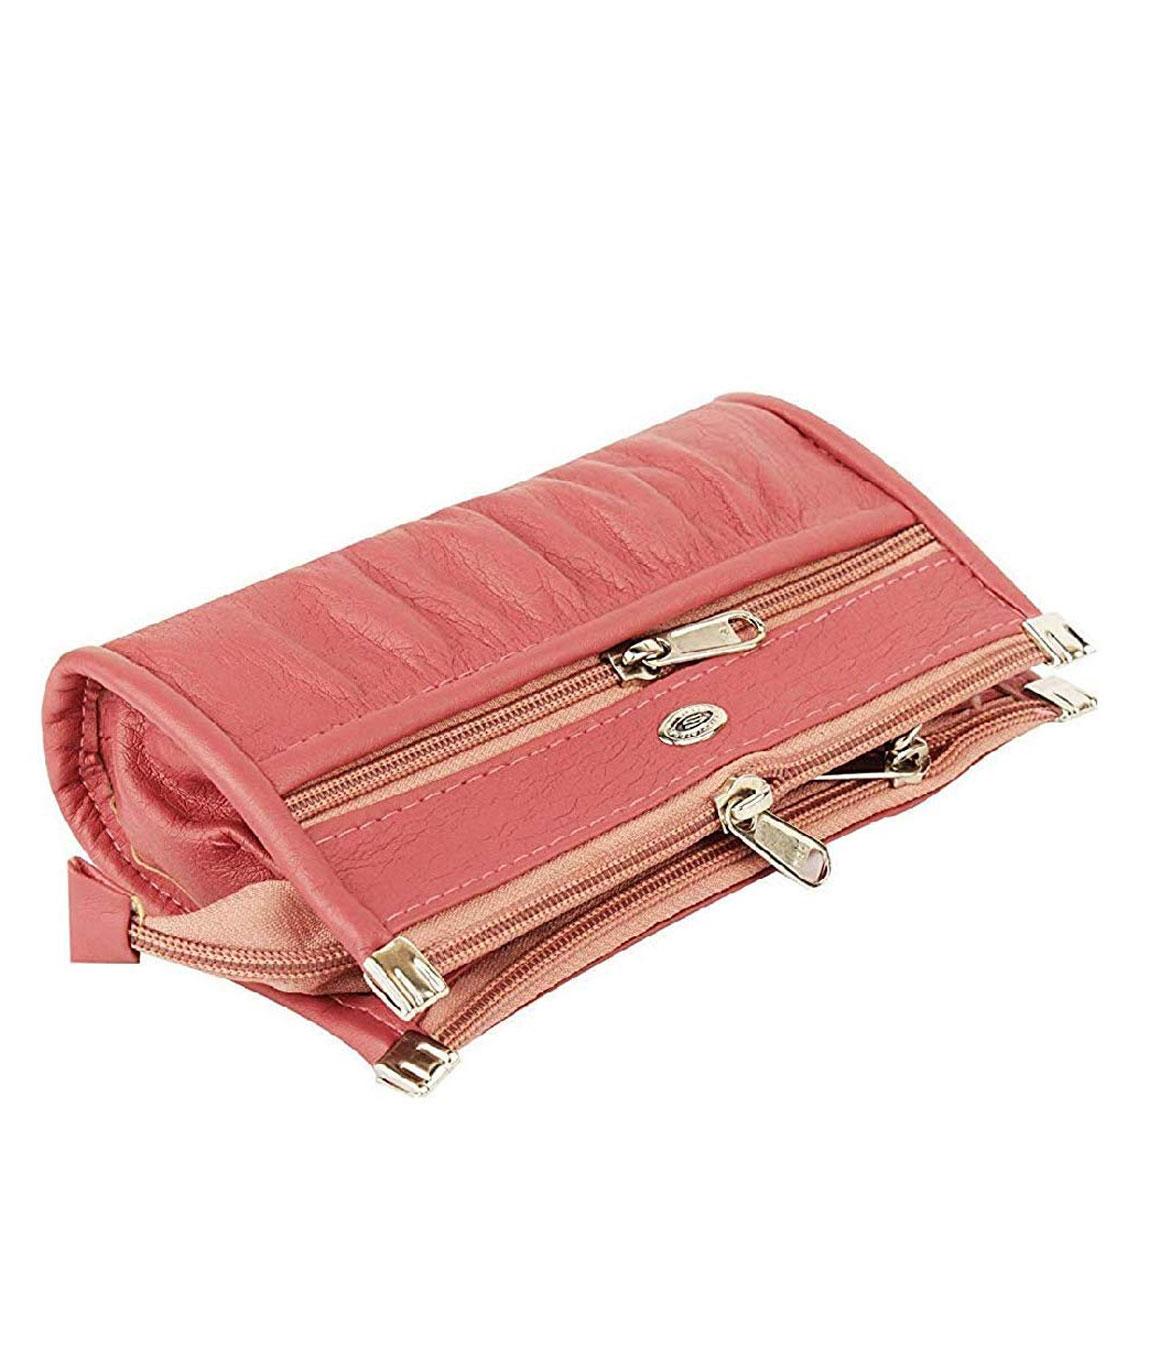 Kavi`s Quality PU Leather Women`s and Girls Wallet Clutch Purse Handbag (Pink)